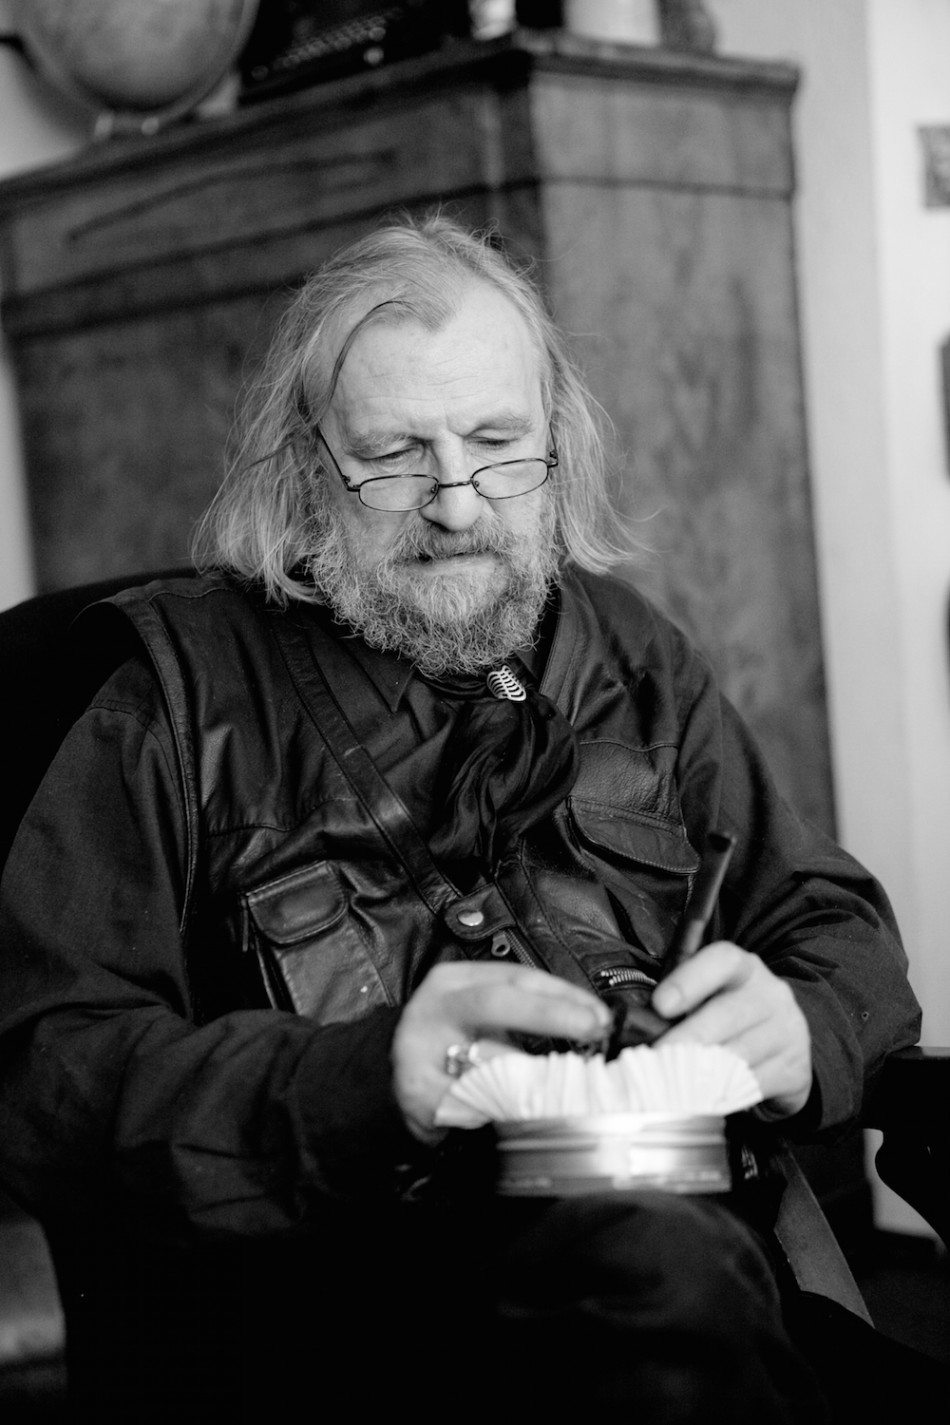 Wilfried M. Bonsack